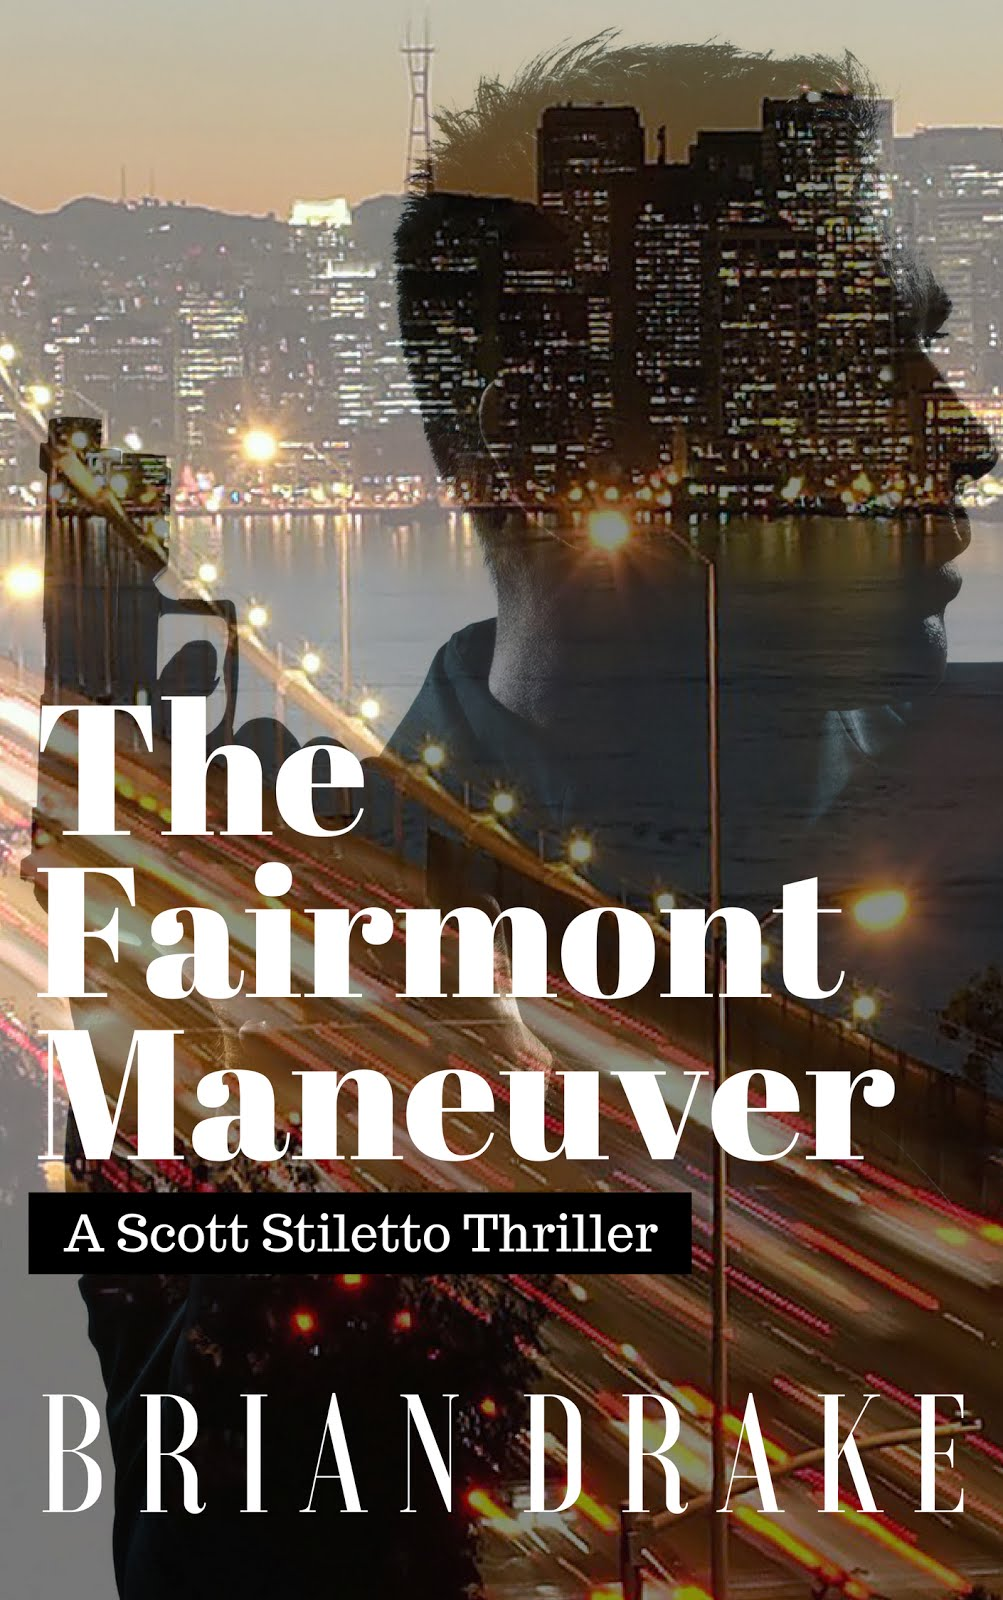 The Fairmont Maneuver: A Scott Stiletto Thriller